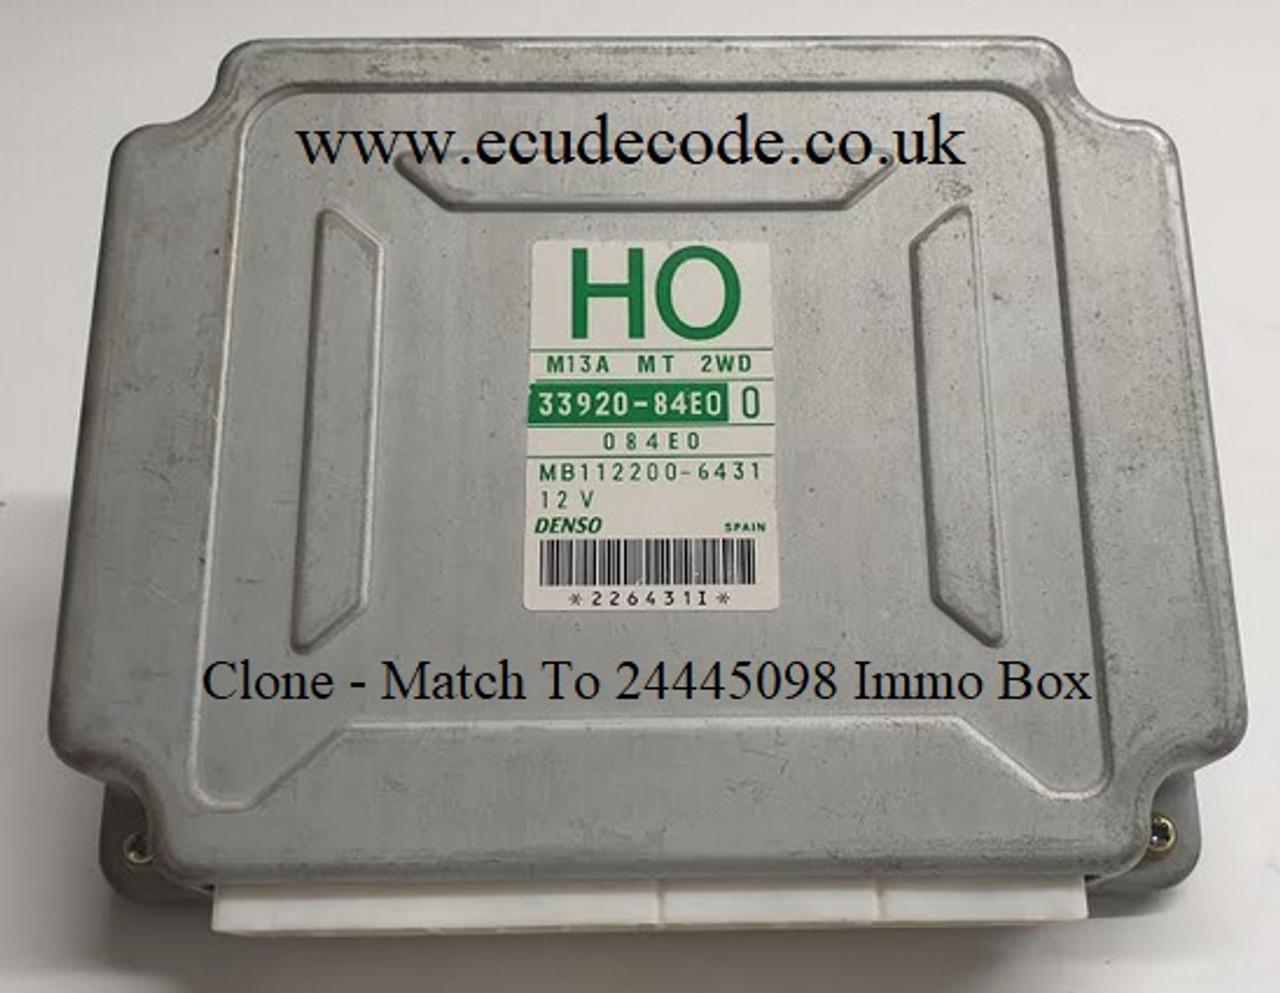 33920-84E0 | H0 | M13A MT 2WD | MB112200-6431 Suzuki Wagon R Plug & Play ECU - Clone Or Match To Immobiliser Box 24445098 LS From ECU Decode Westbury Wiltshire GB